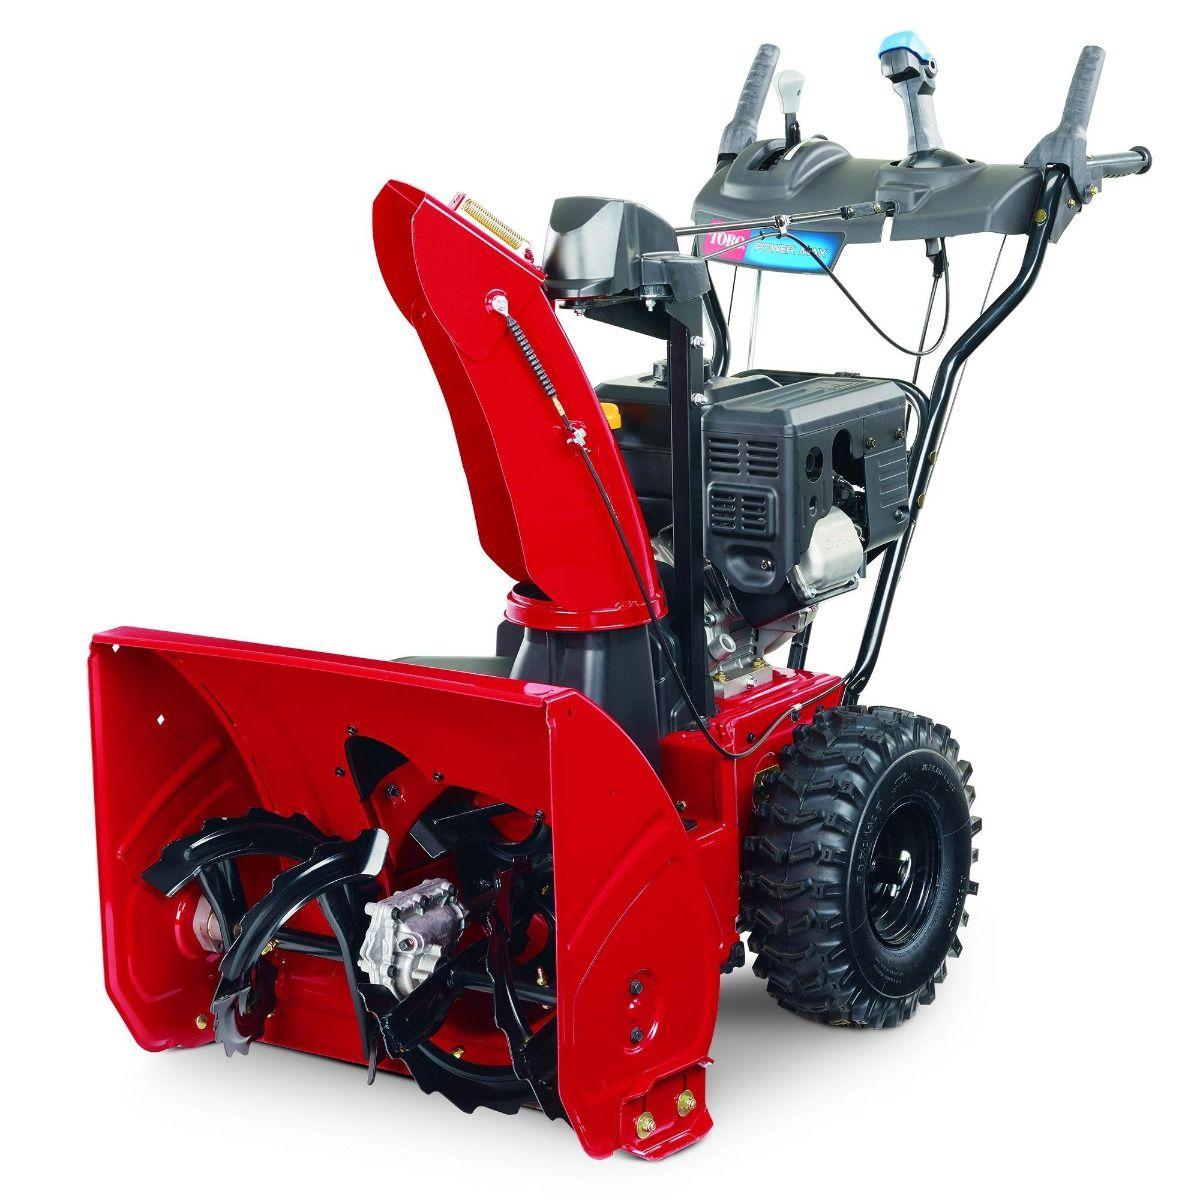 Toro 37798 Power Max 824OE Electric Start Snowblower